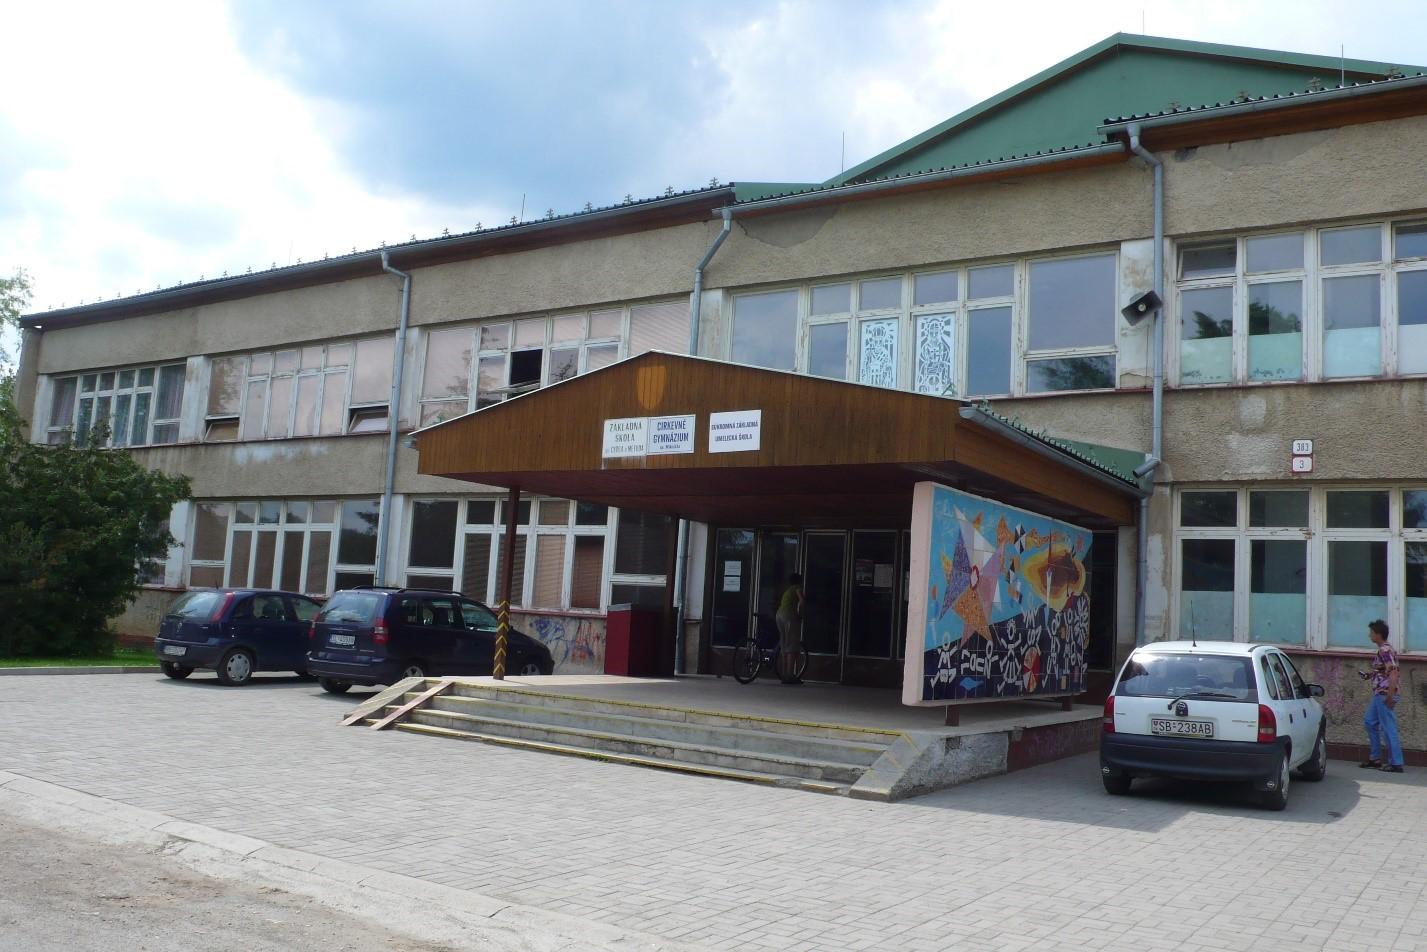 Catholic-High-School-In-Slovakia-1.jpg